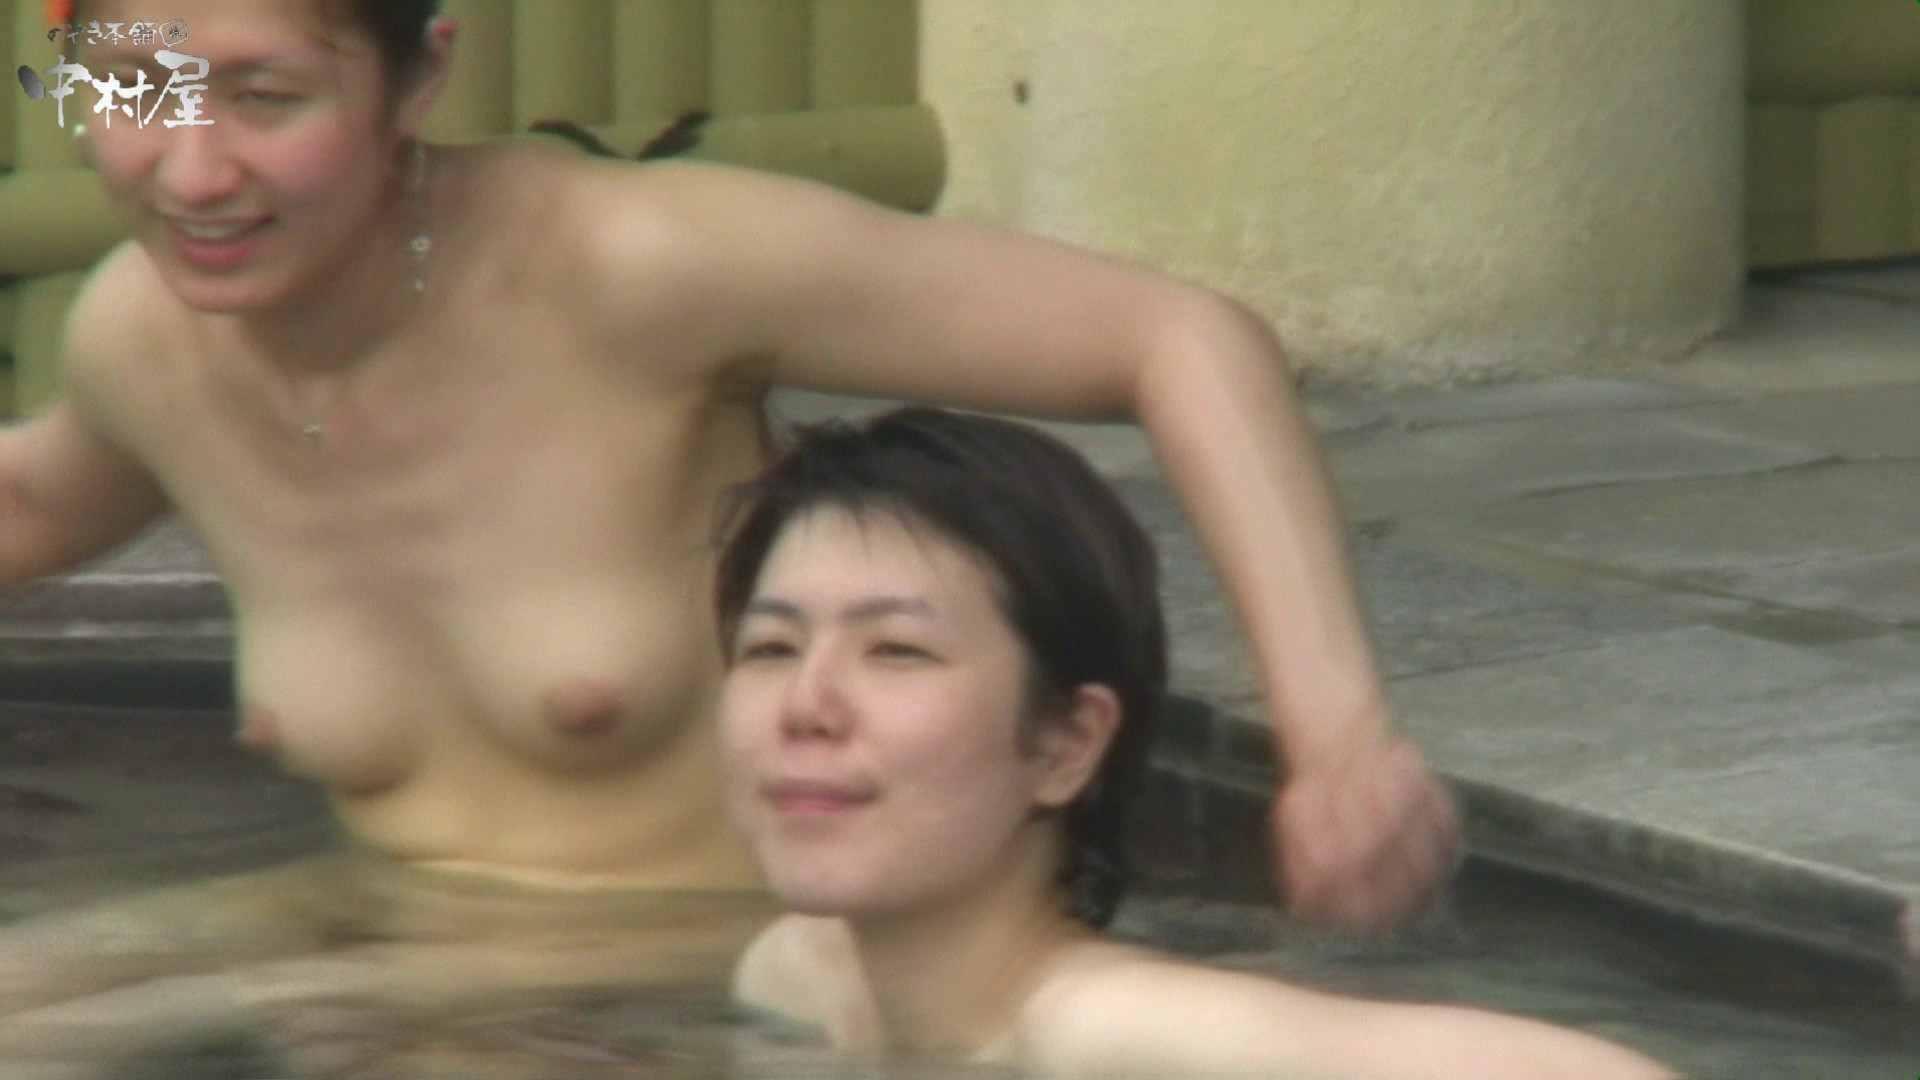 Aquaな露天風呂Vol.945 盗撮 | OLエロ画像  60PICs 28